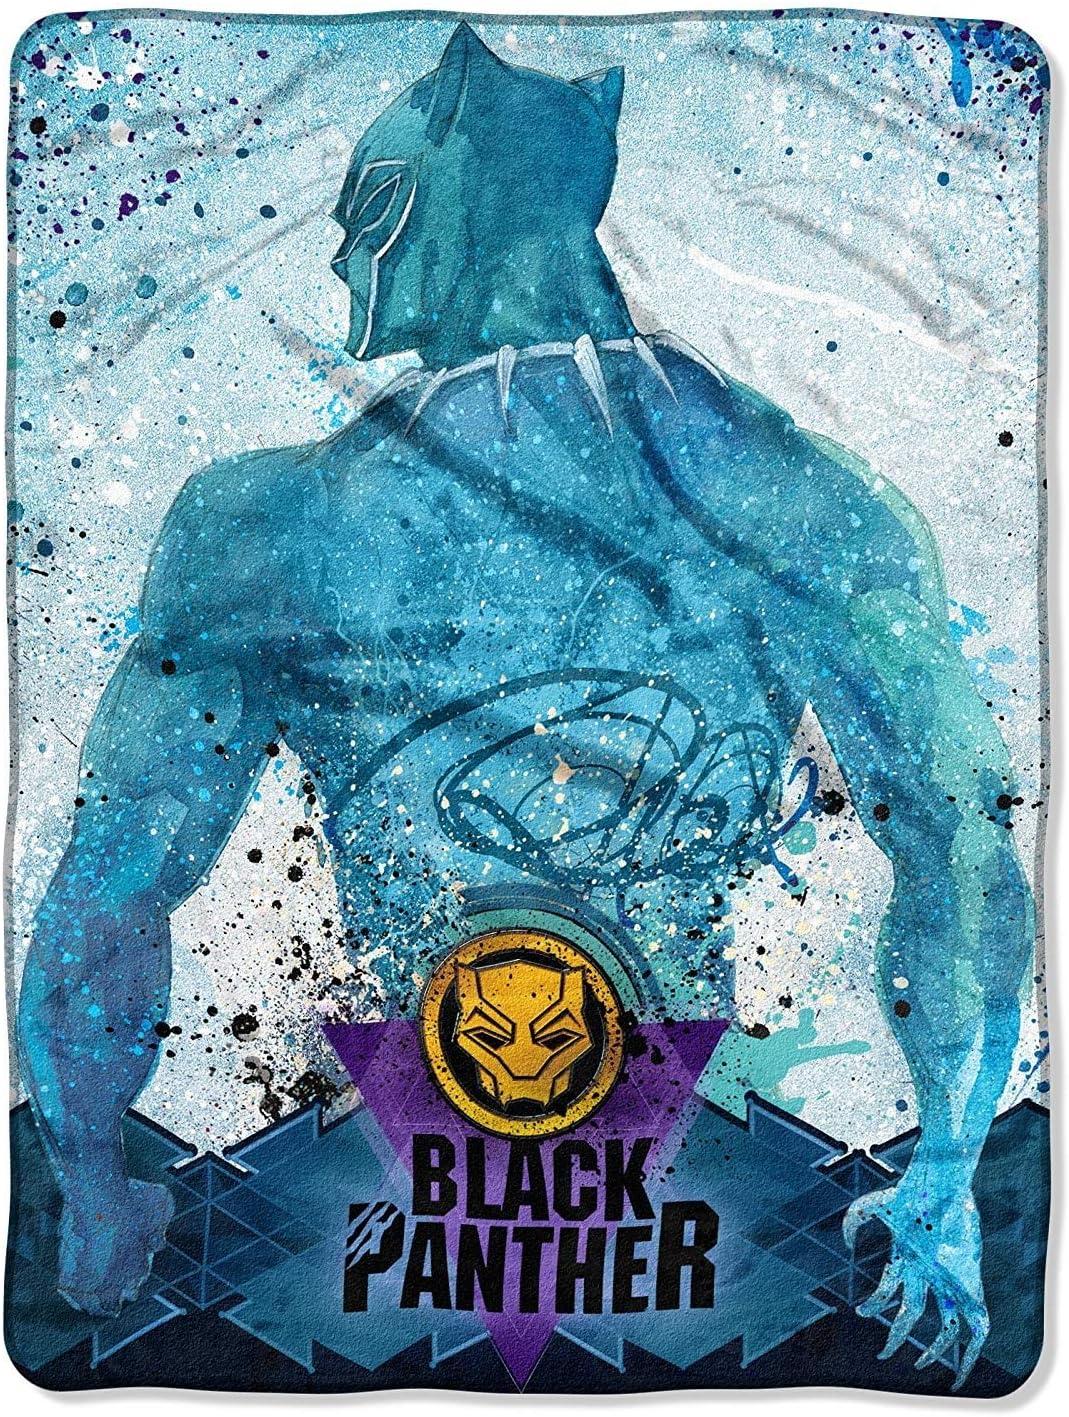 Kids Warehouse Black Panther Icon Splatter Super Plush Throw 46 by 60